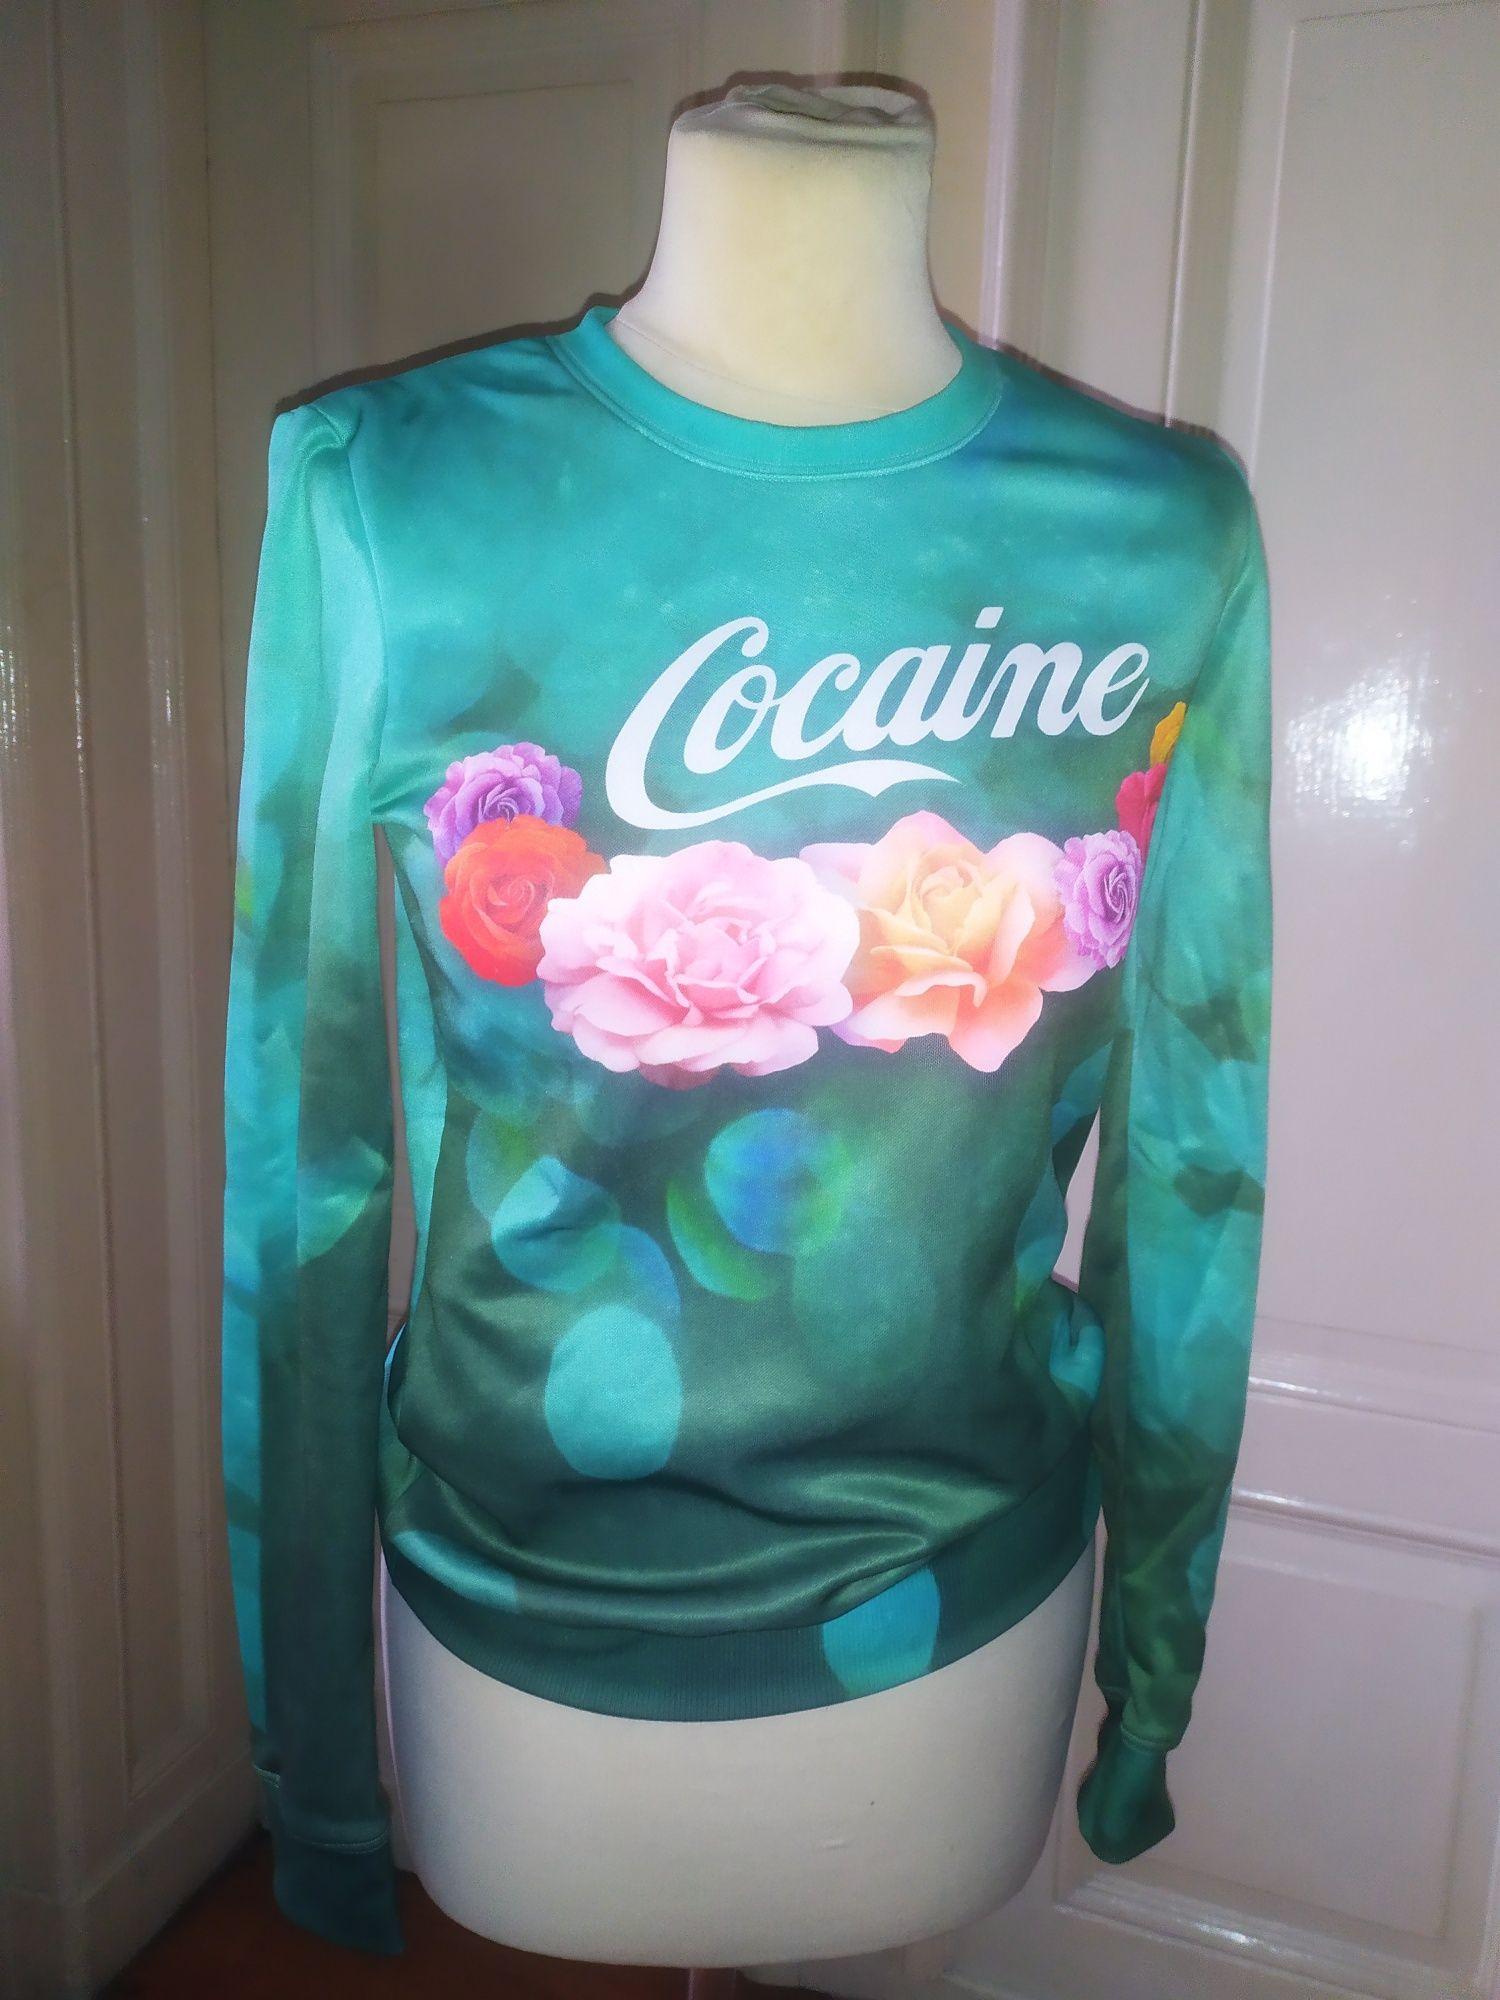 Bardzo ładna I modna bluza